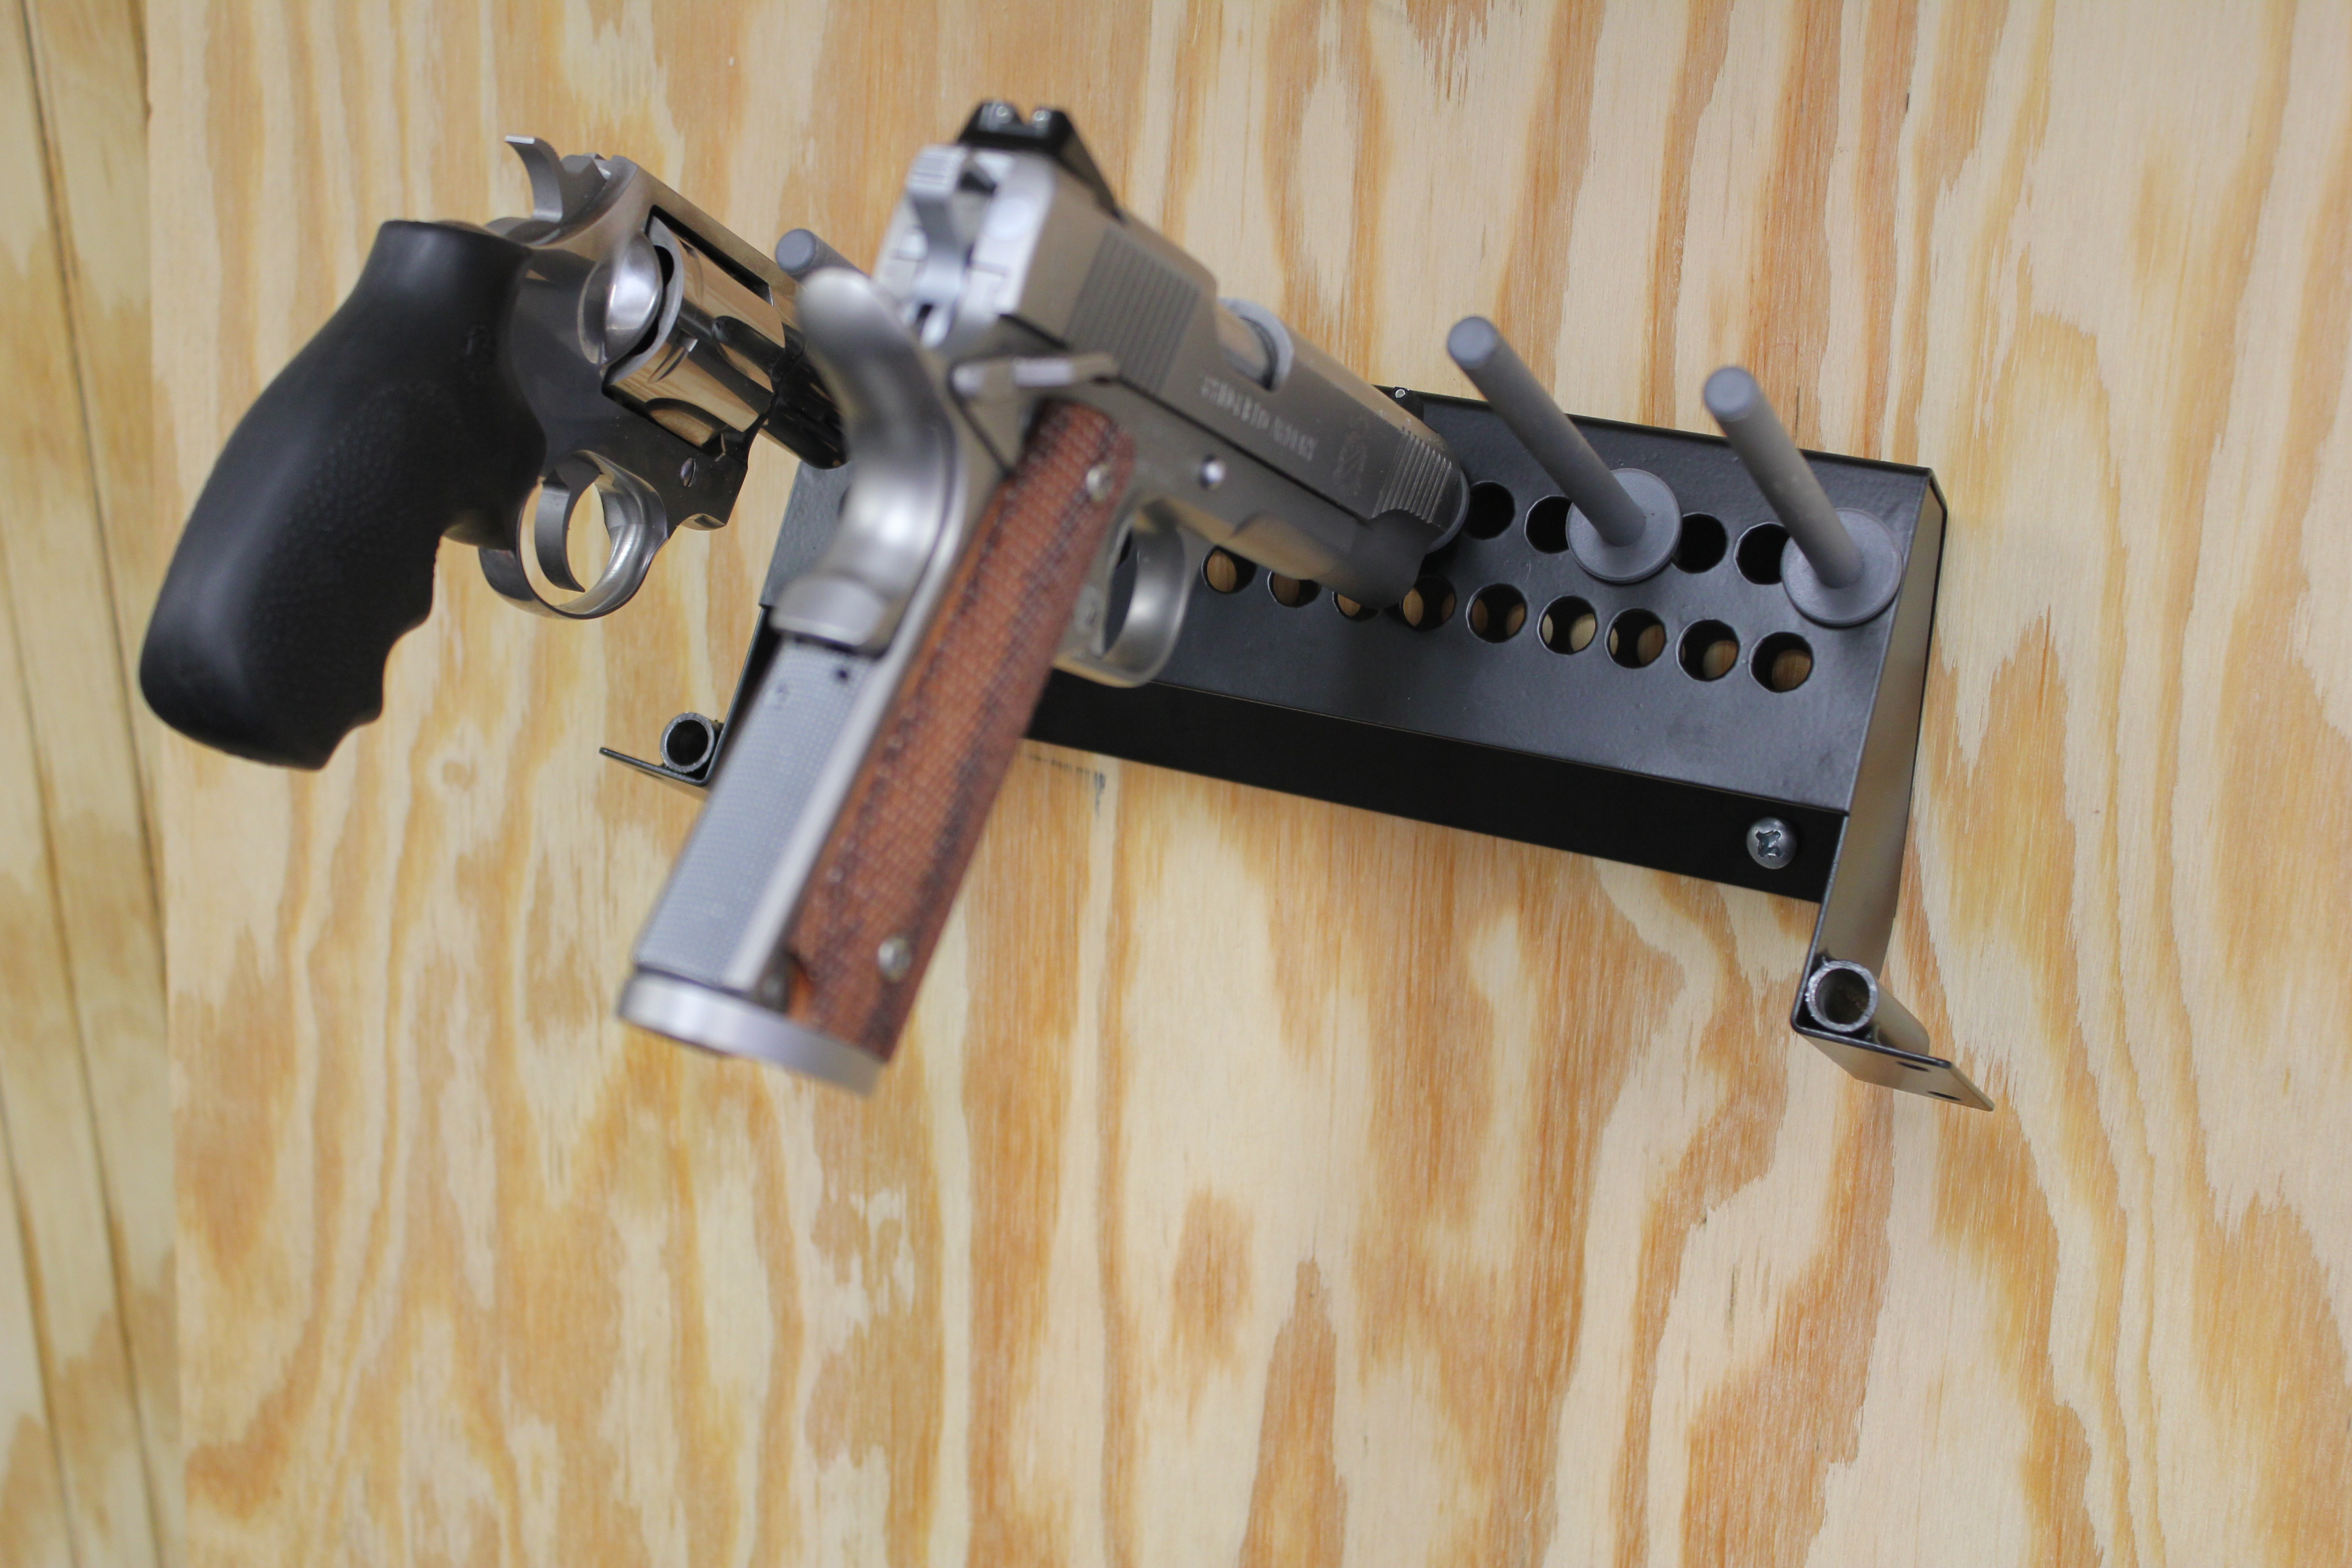 magazine clip holders for guns - HD3456×2304